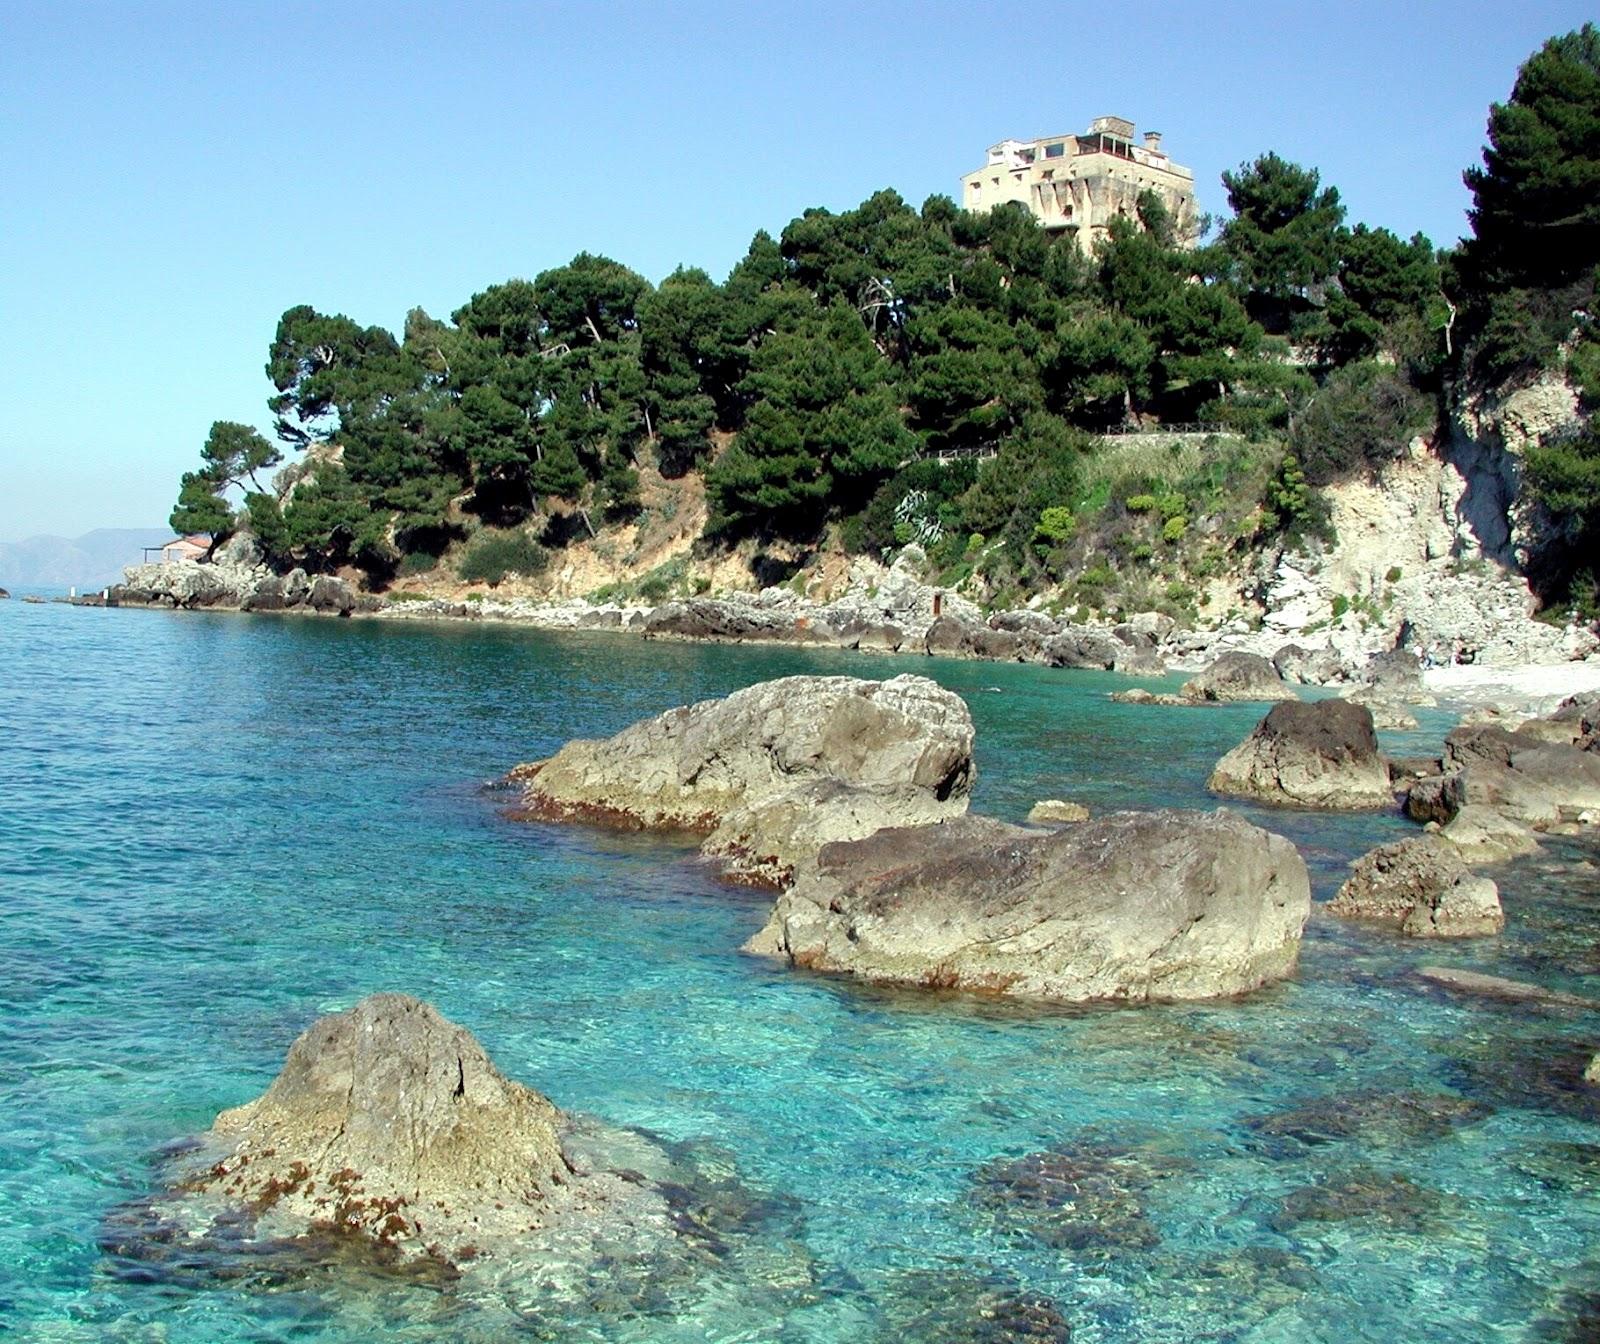 Spiagge - Maratea